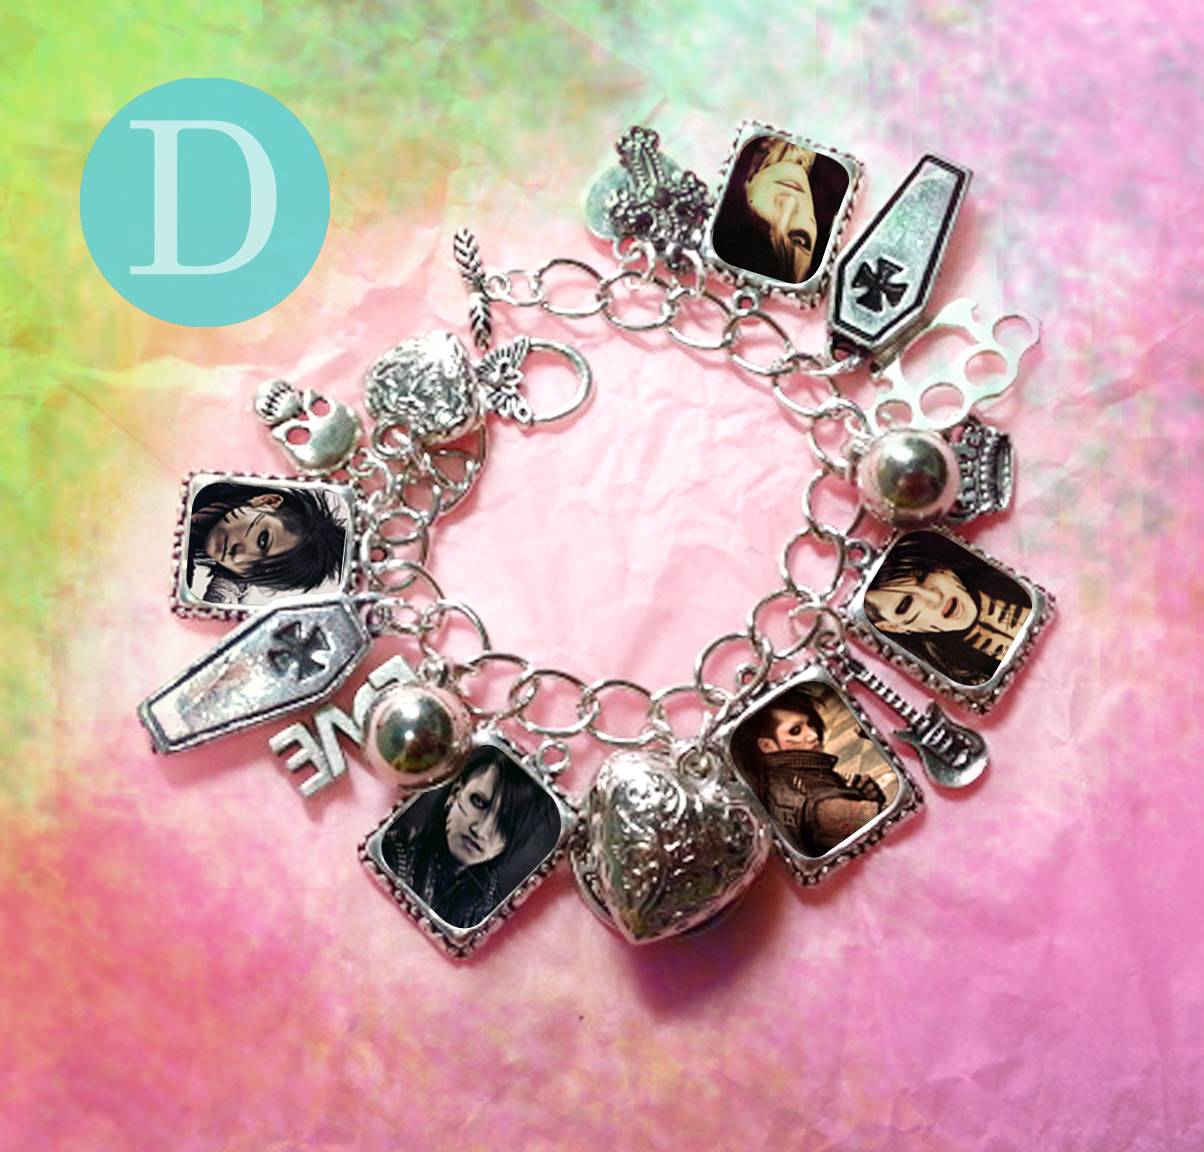 bvb_black_veil_brides_ashley_purdy_charm_bracelet__bracelets_2.jpg